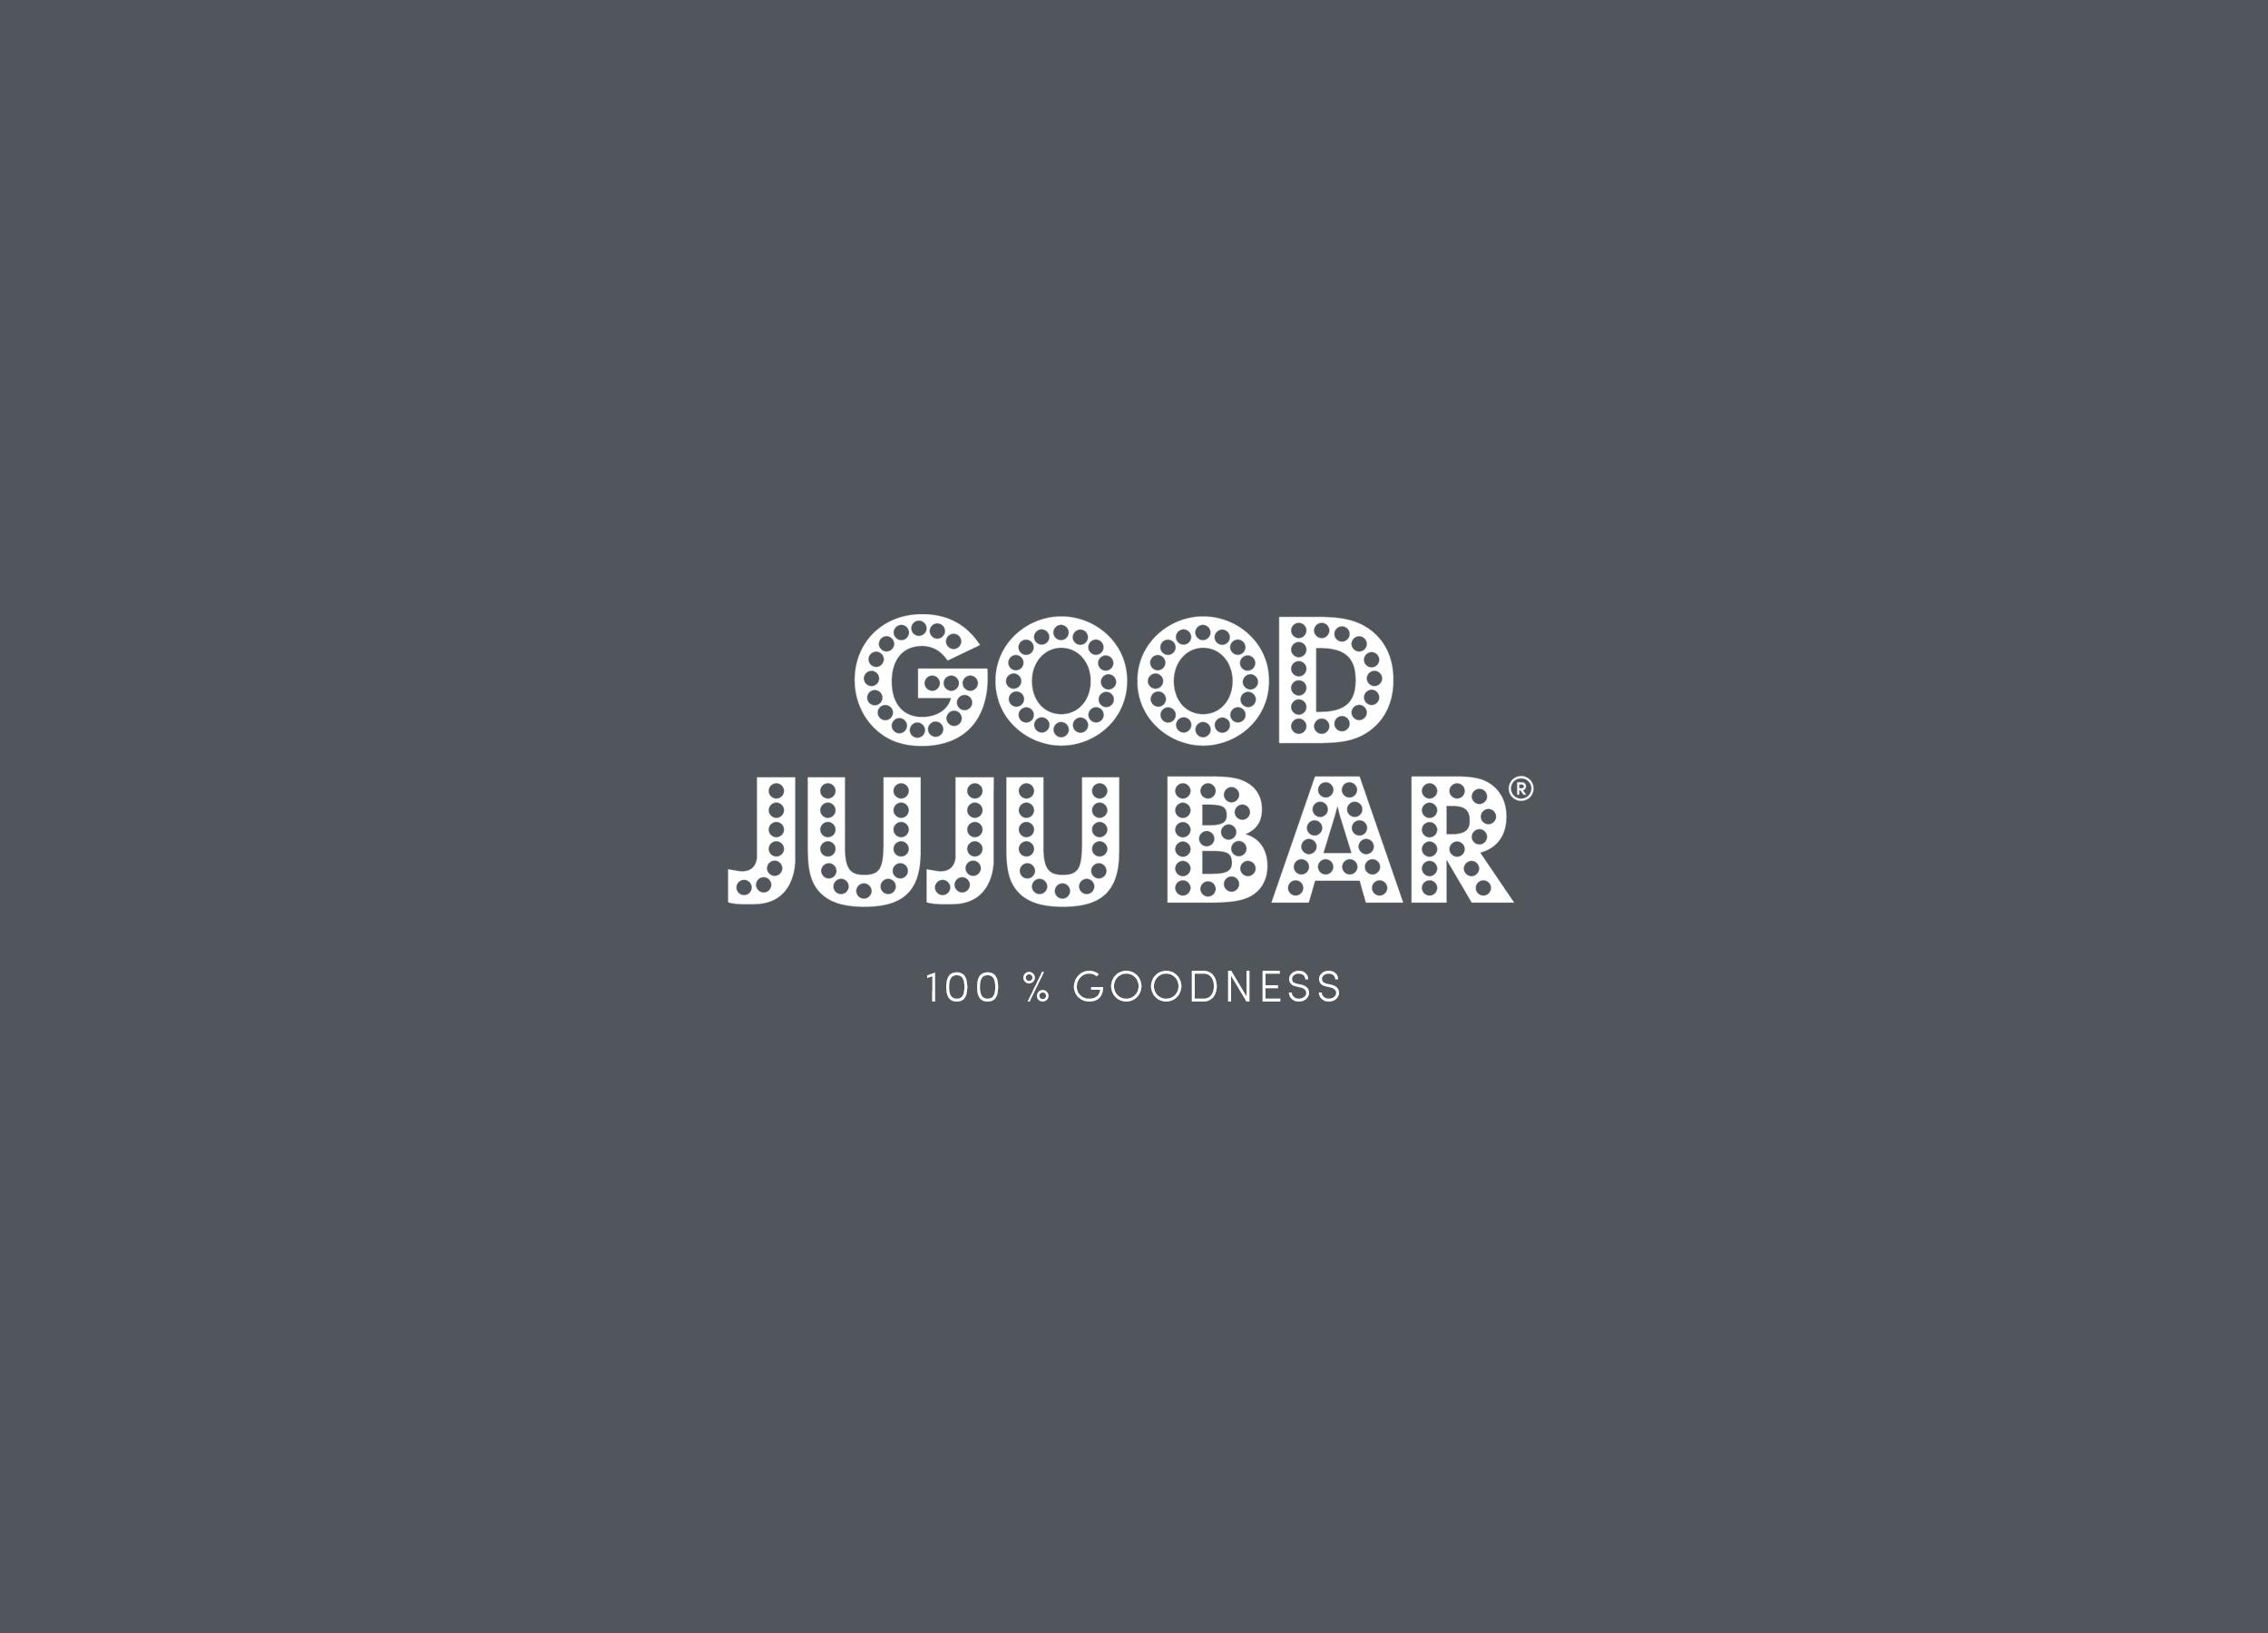 Good Juju Bar identity